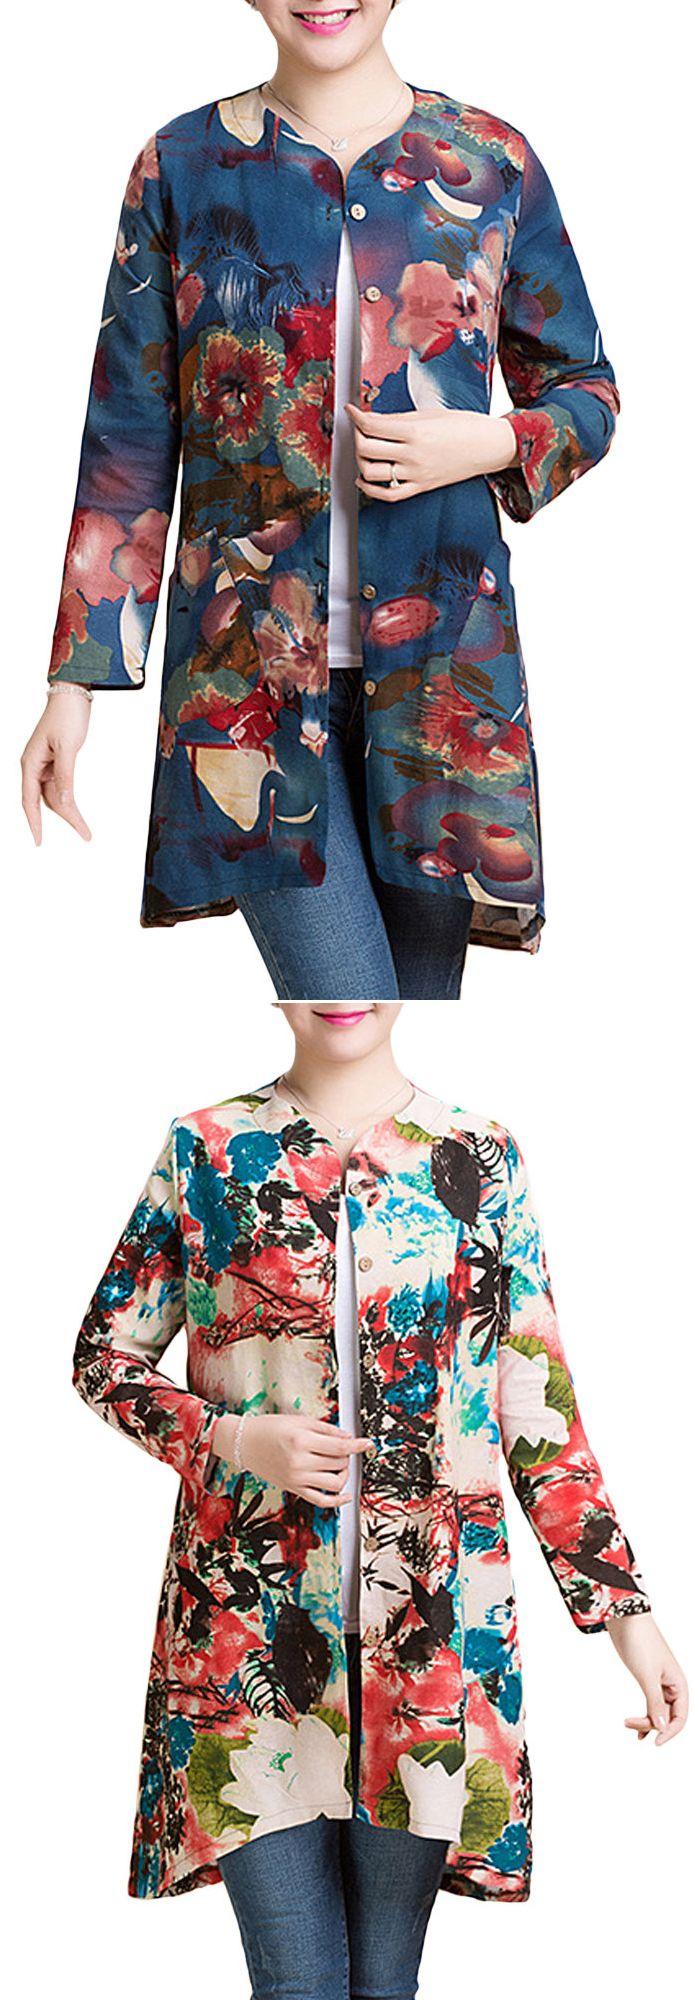 5af5ab4040 Fashion · US  18.09 O-NEWE Vintage Women Loose Printing Long Sleeve Blouse